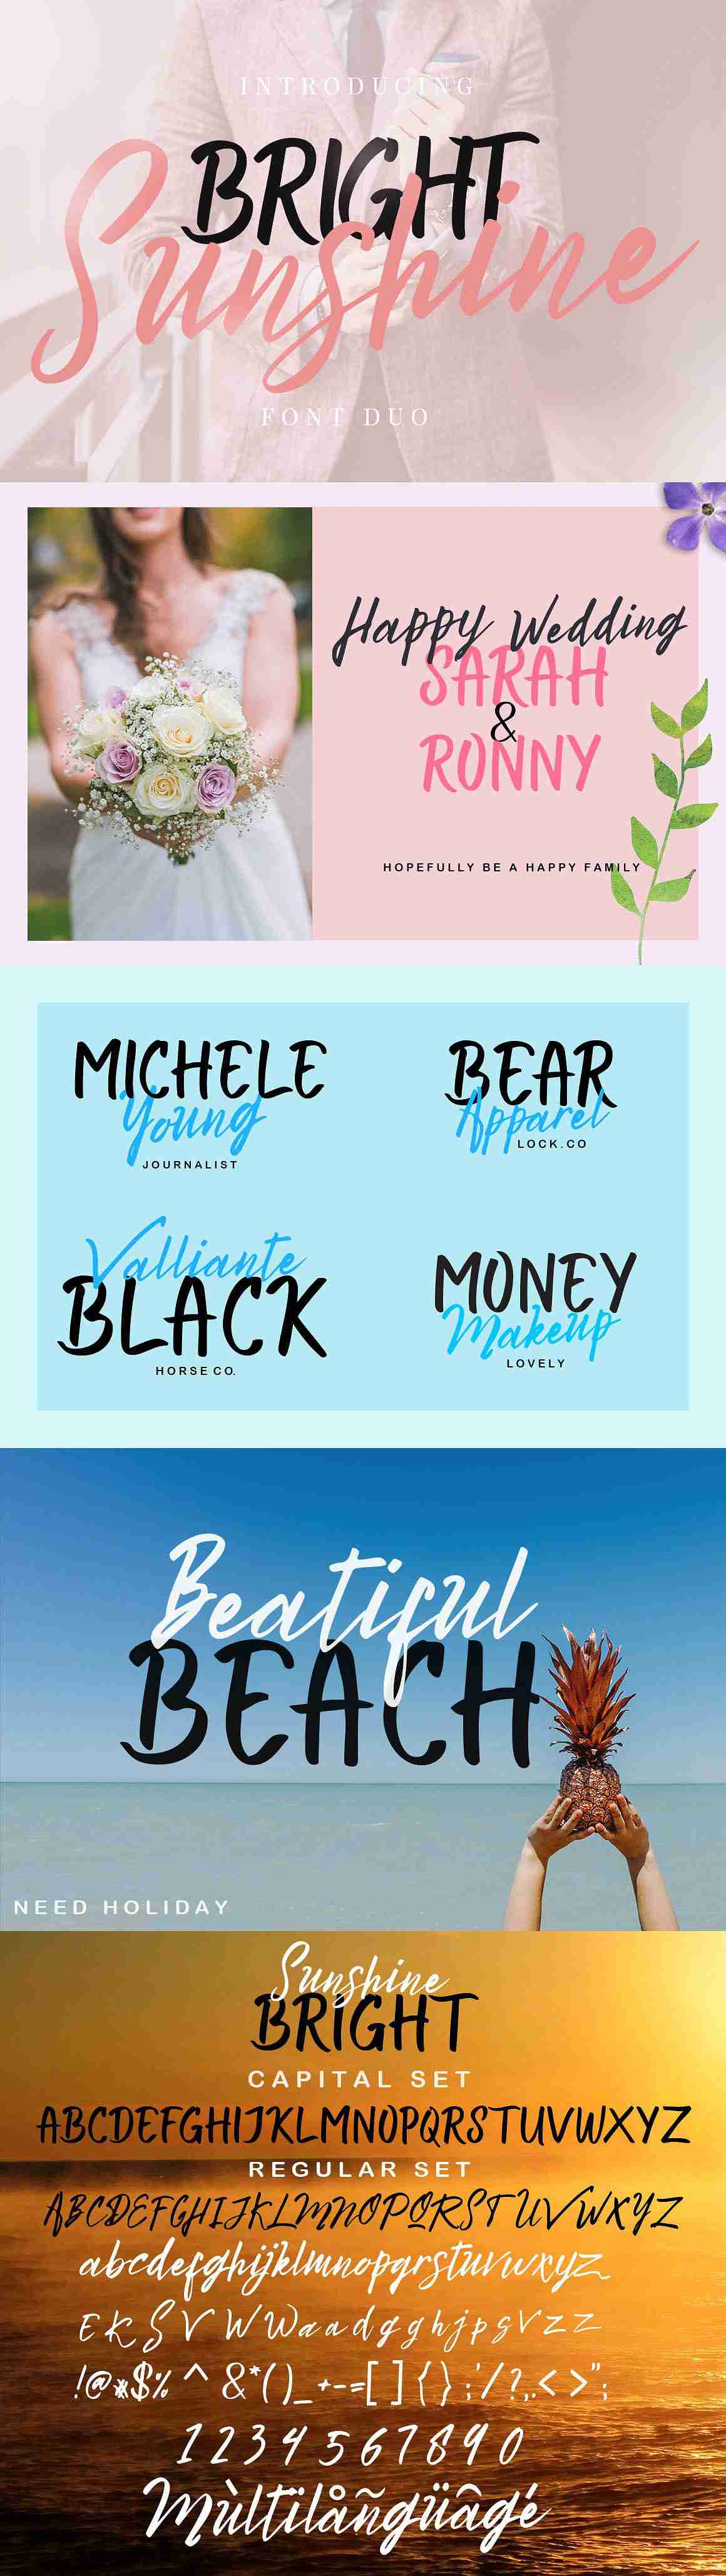 bright-sunshine-script-font